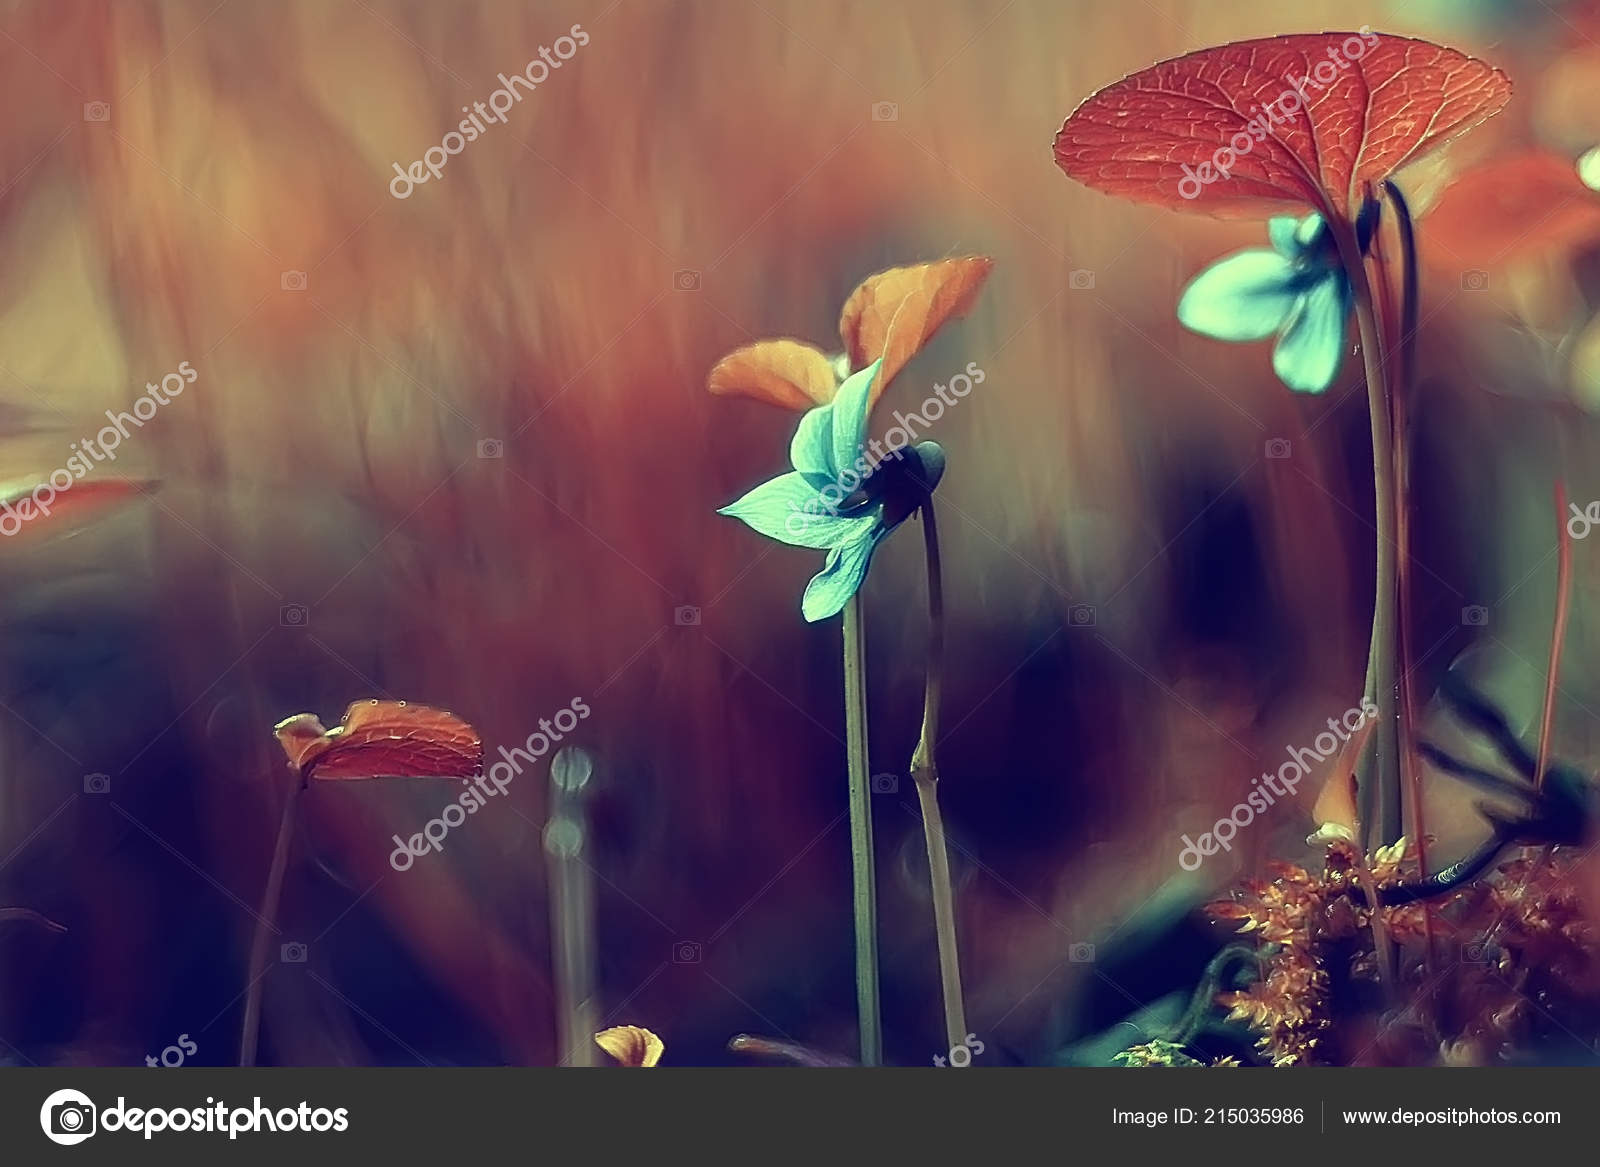 Nature Beauty Flowers Background Flowers Vintage Toning Beautiful Nature Photo Stock Photo Image By C Xload 215035986